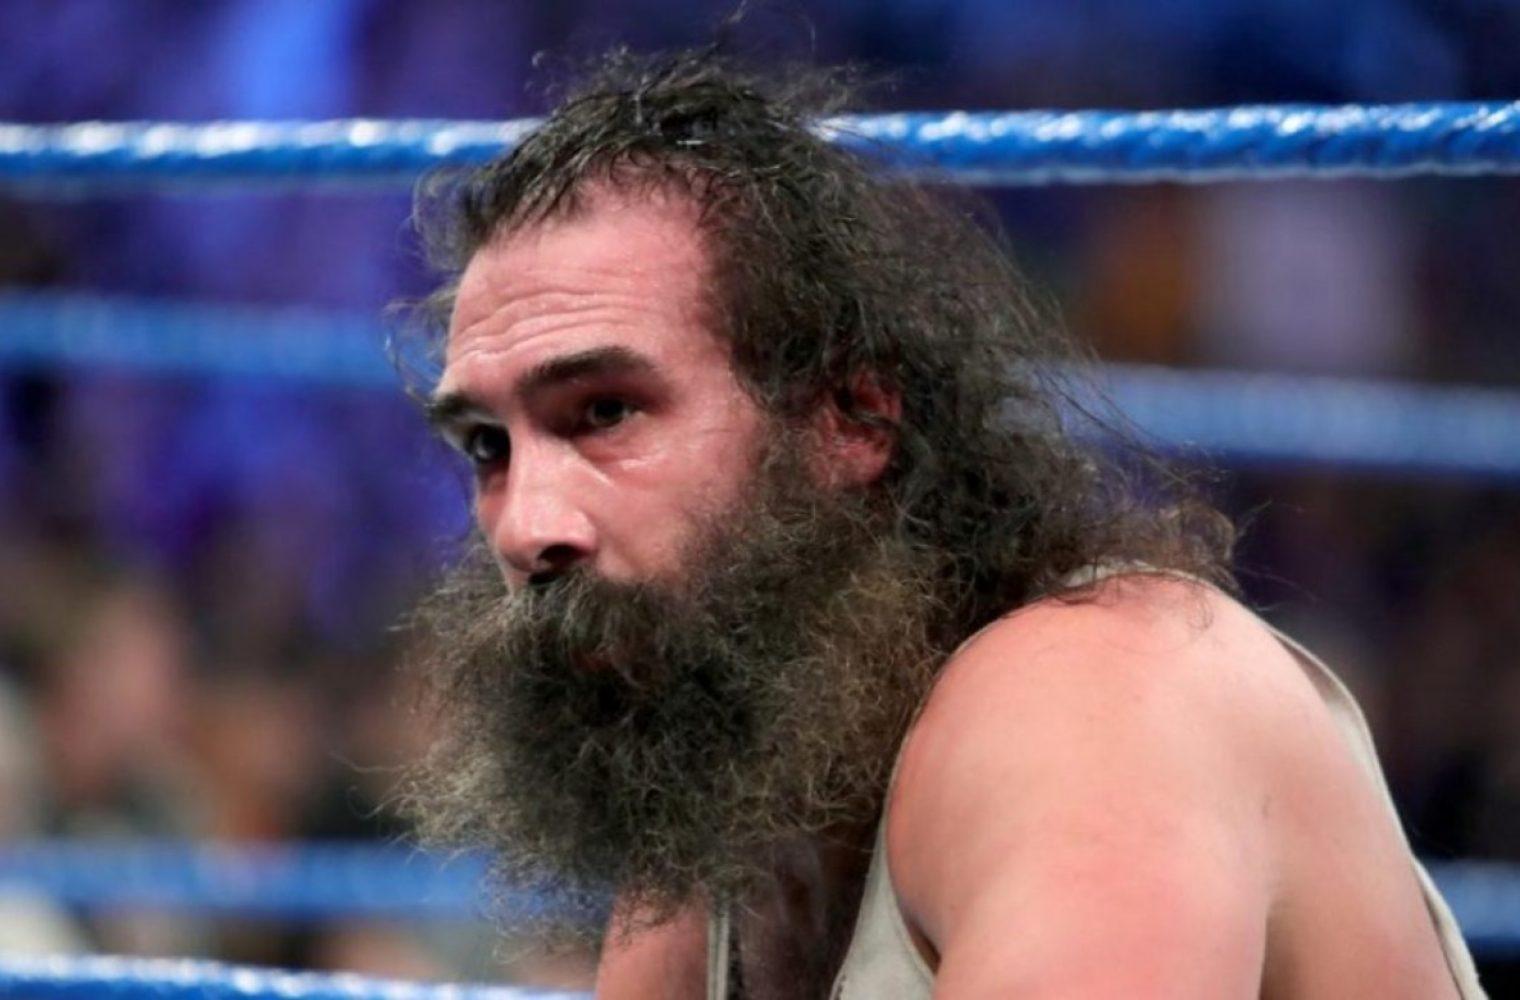 Luke Harper Is Preparing For Life After WWE